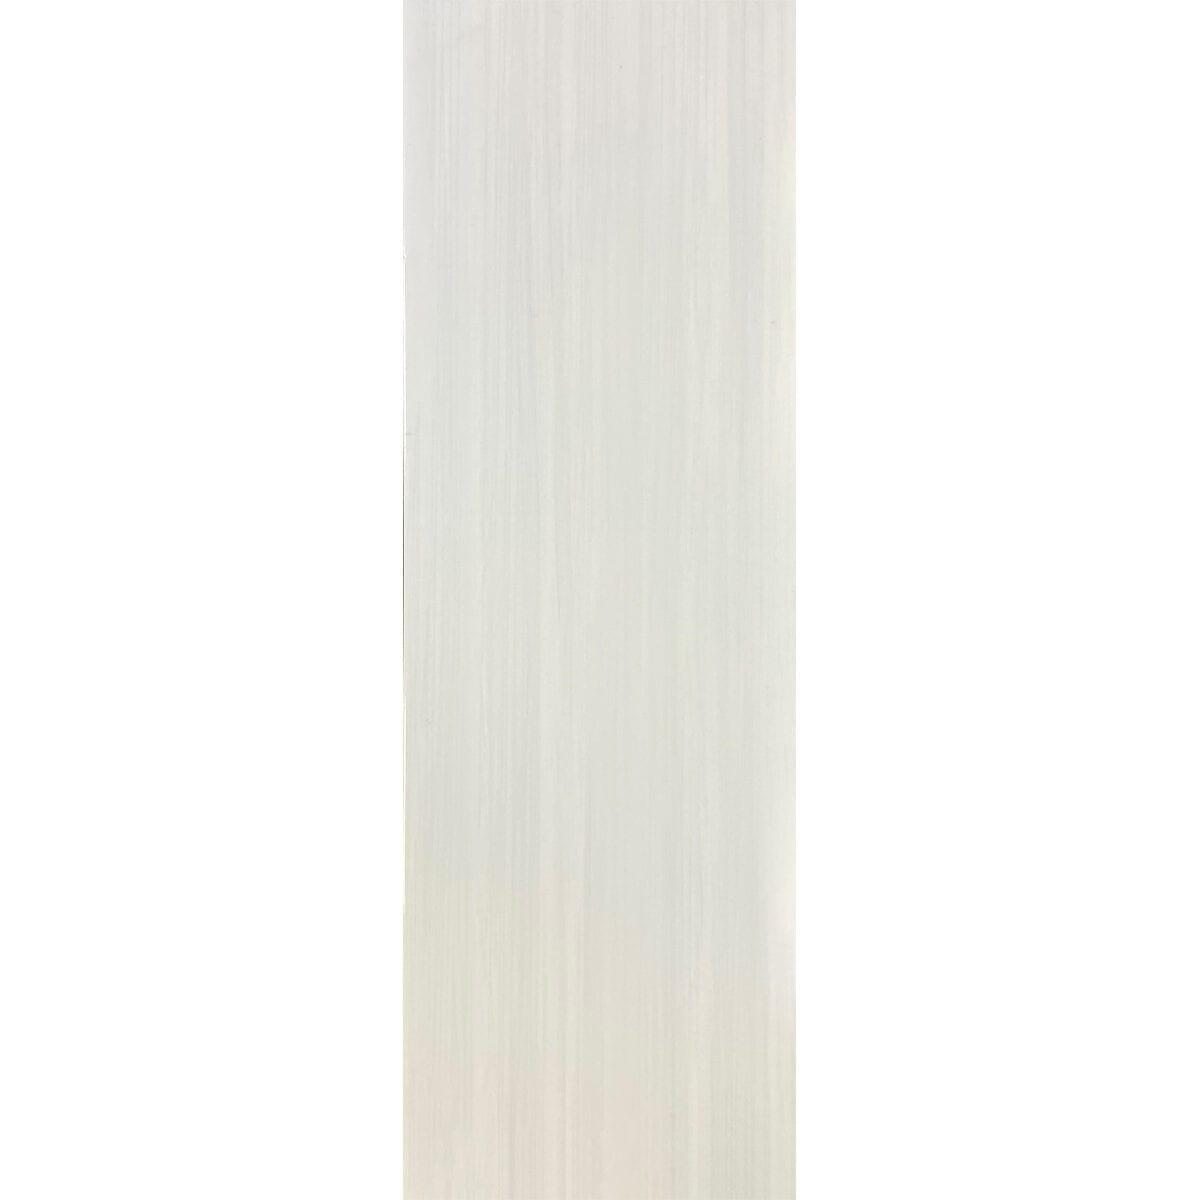 Aberdeen Blanco Glossy 10x30 W00029